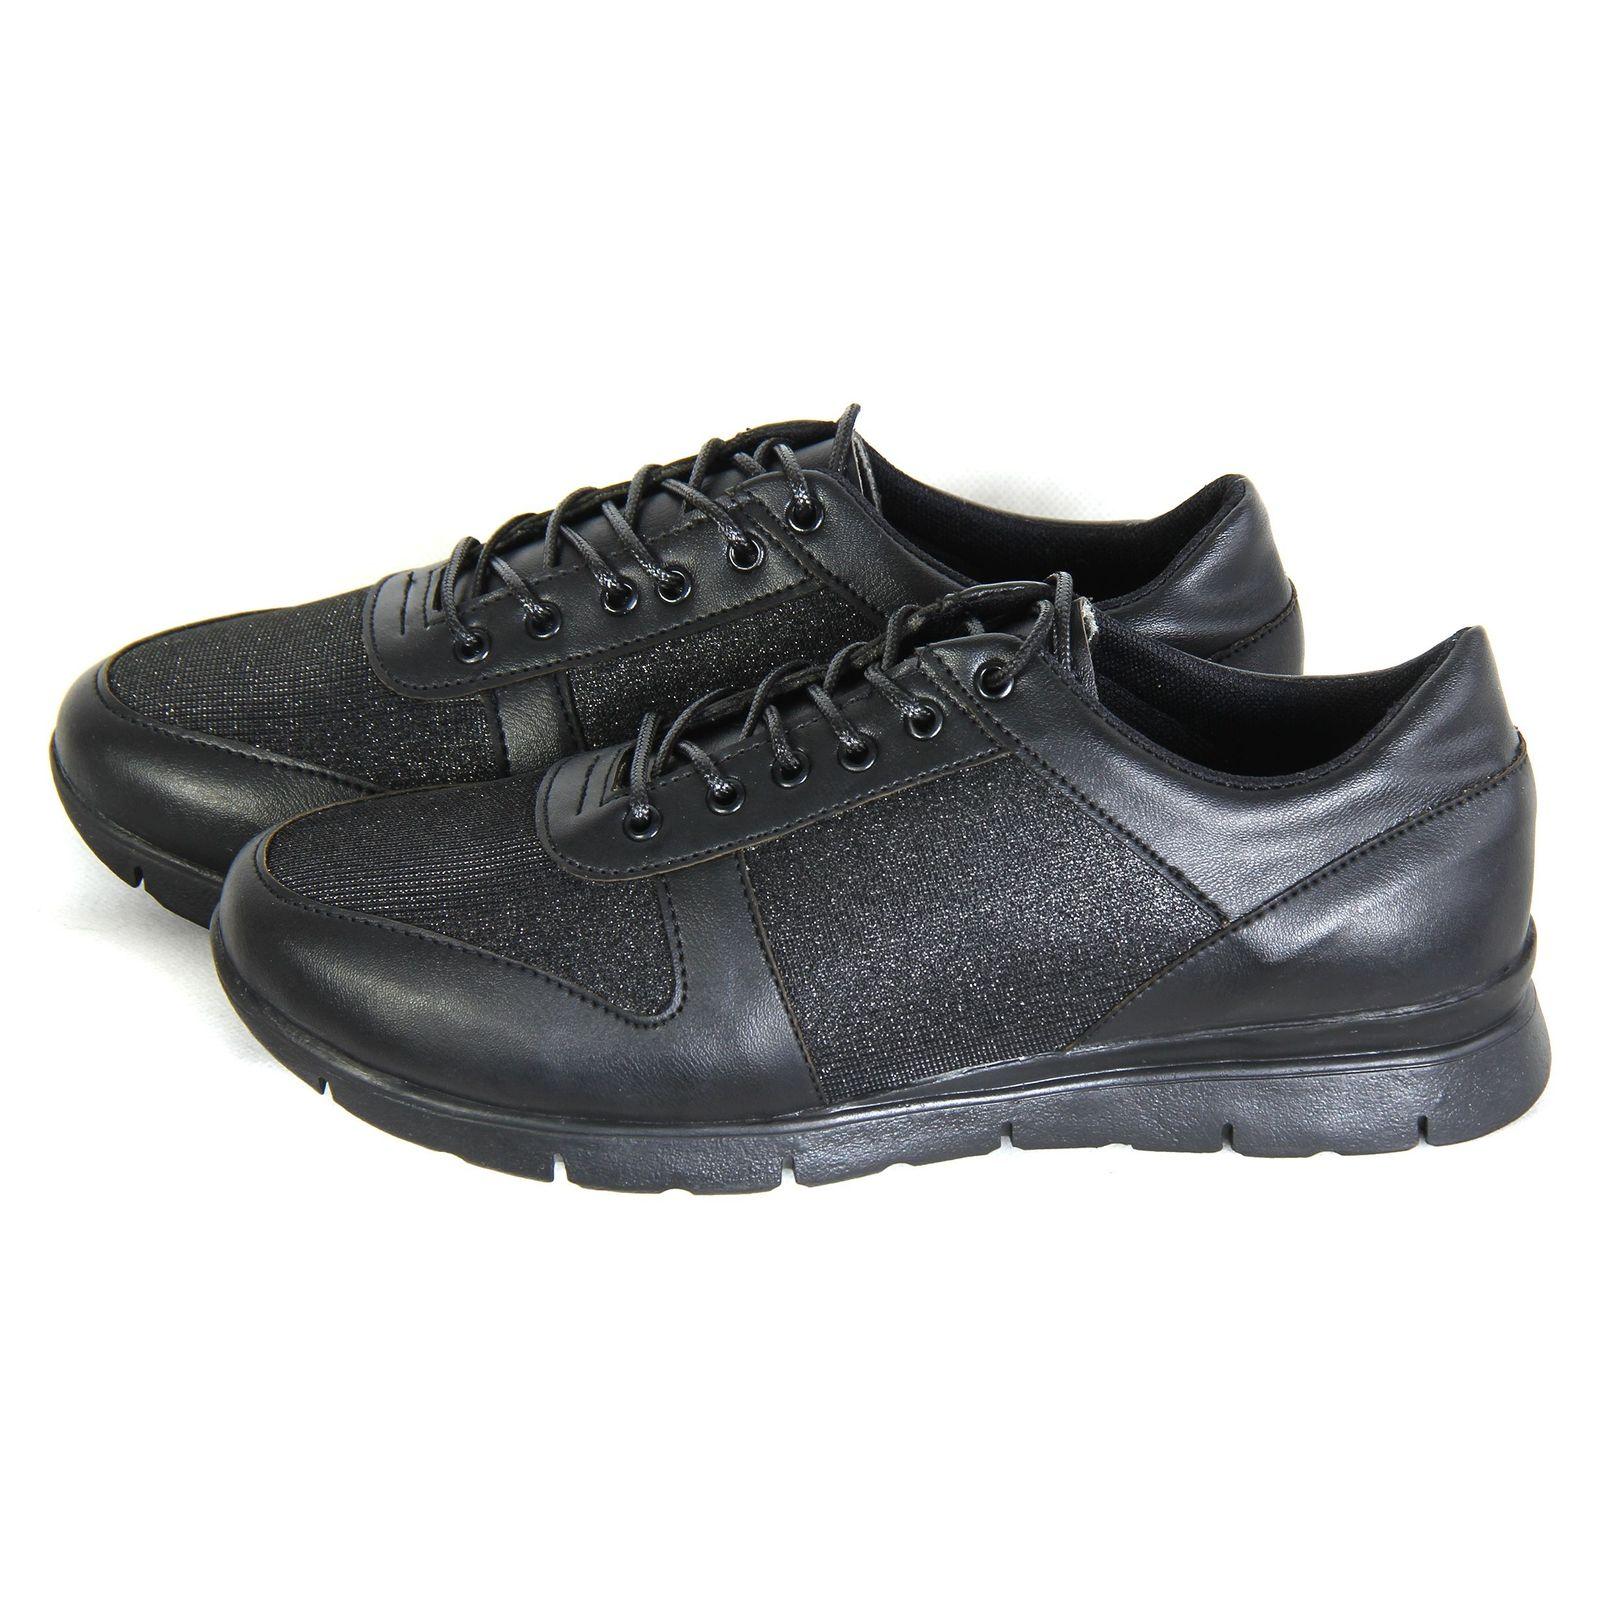 کفش روزمره زنانه کد 013 main 1 1